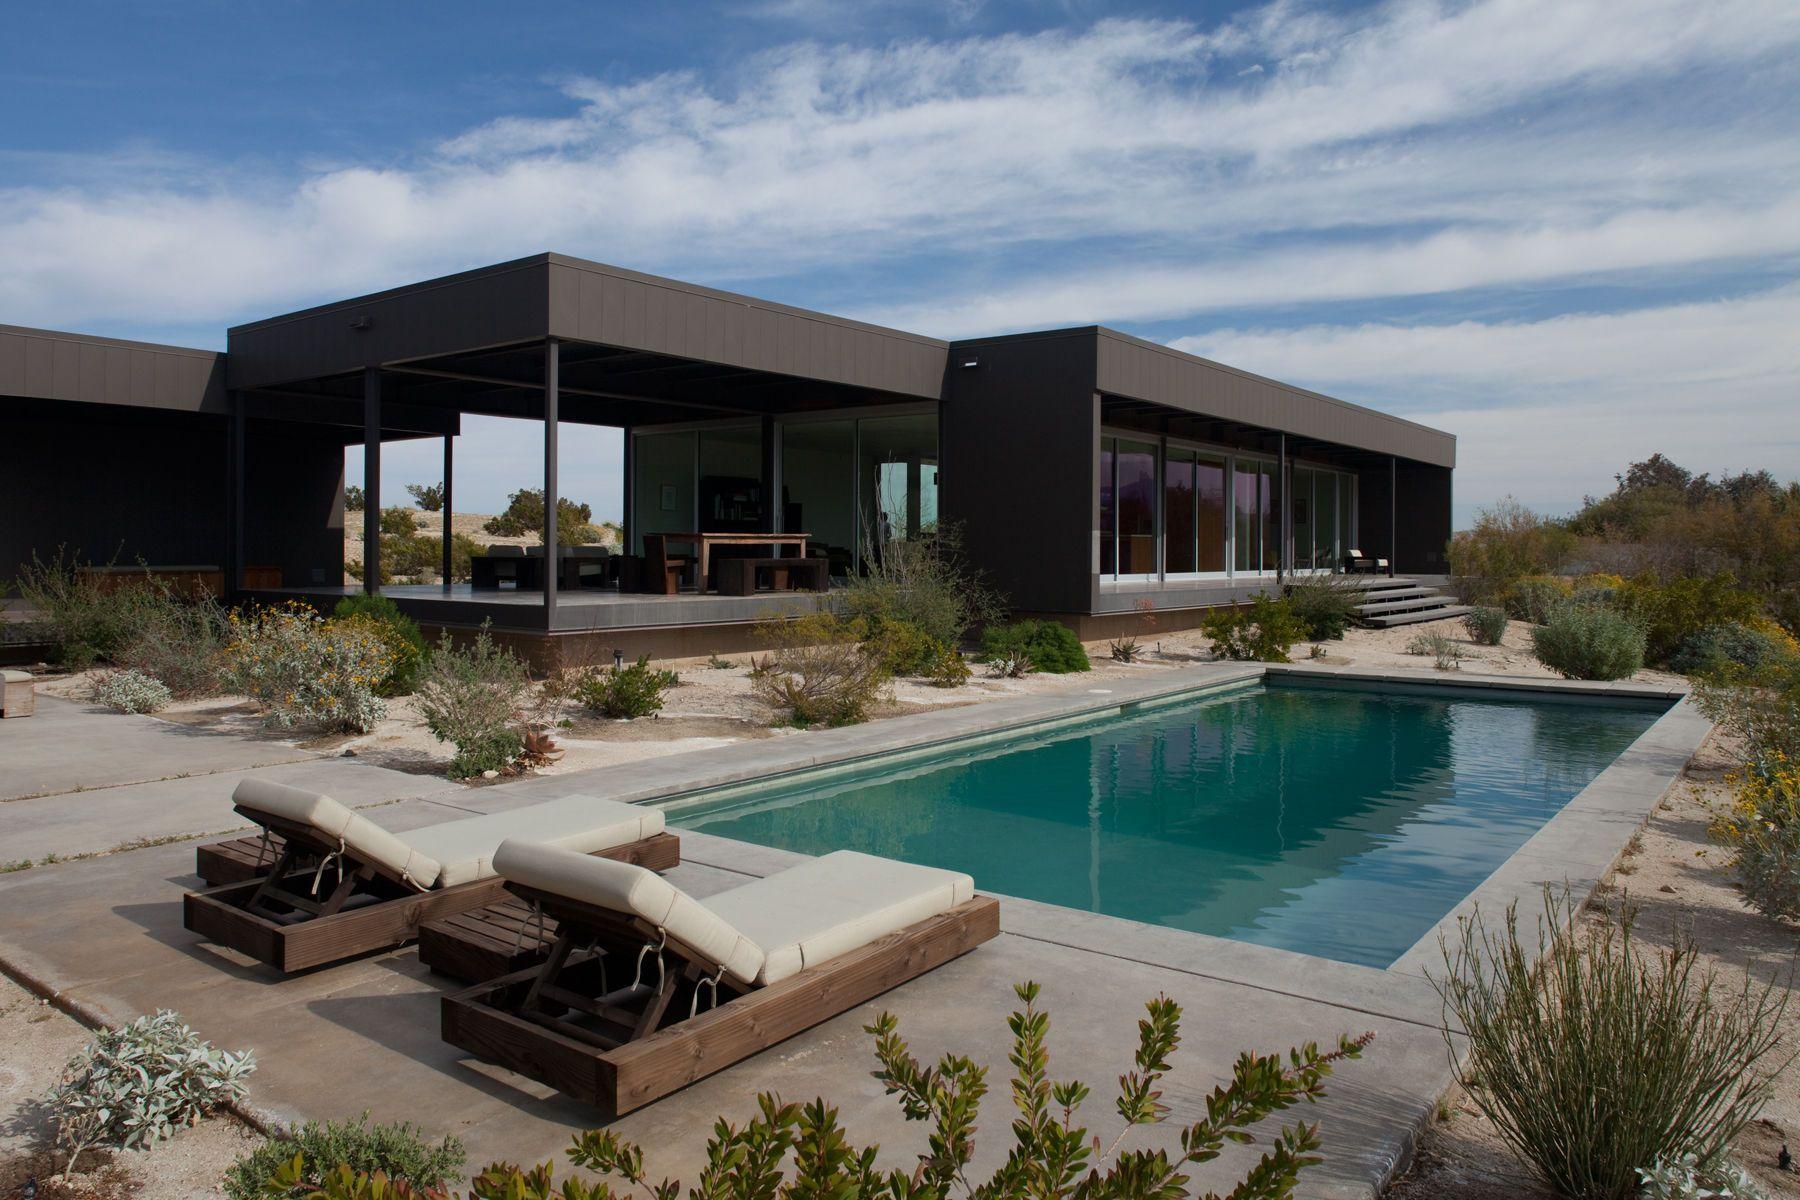 Marmol Radziner Desert House